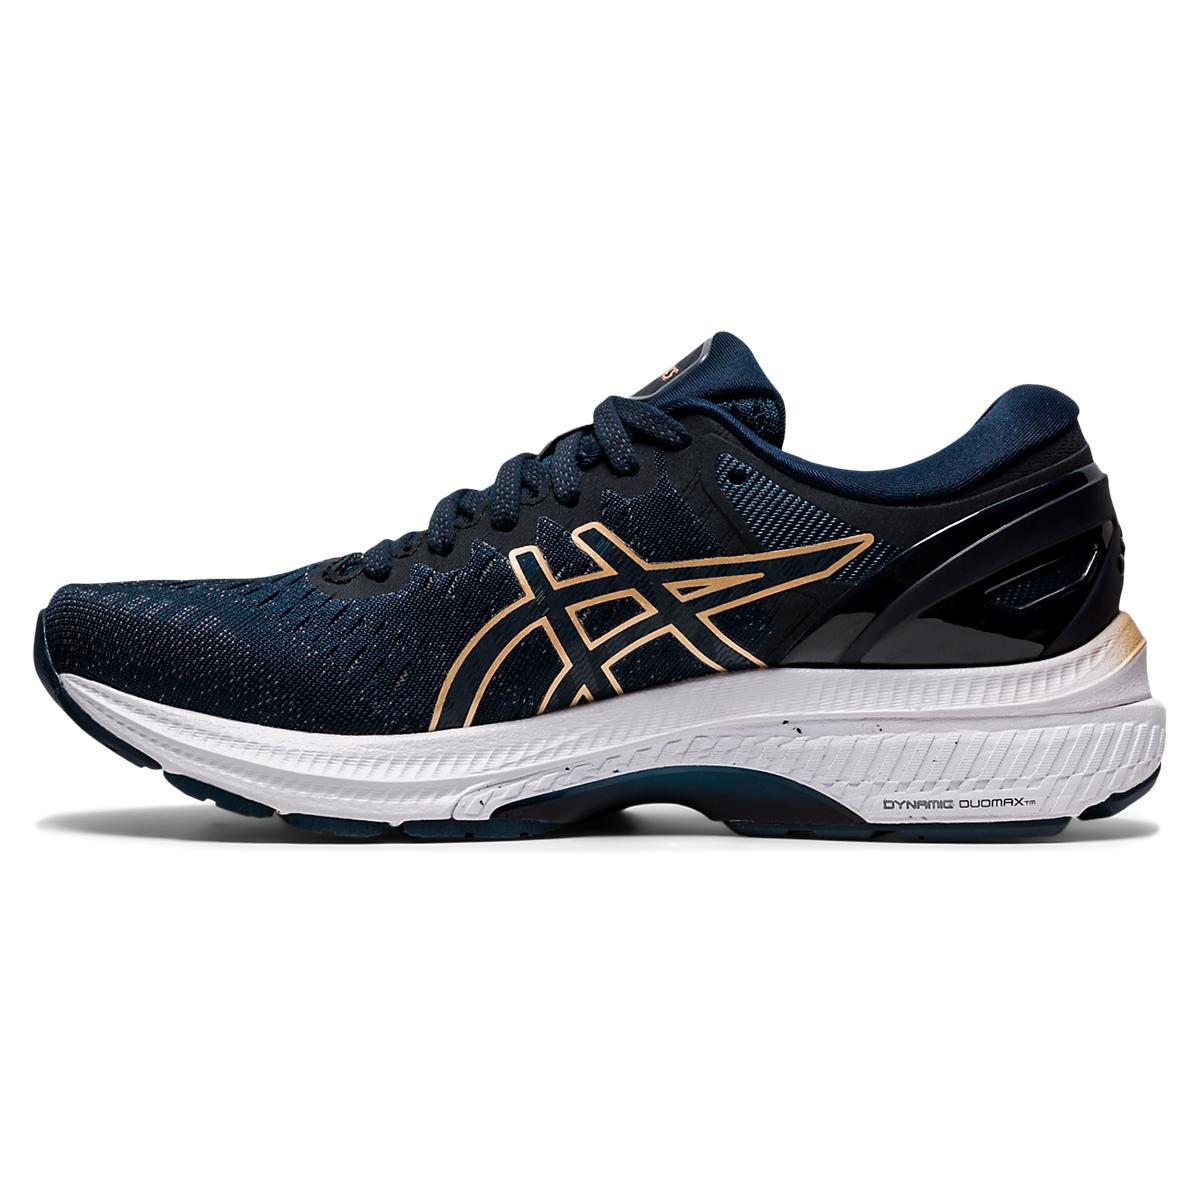 Women's Asics Gel-Kayano 27 Running Shoe - Color: French Blue/Black/Orange - Size: 5 - Width: Regular, French Blue/Black/Orange, large, image 2